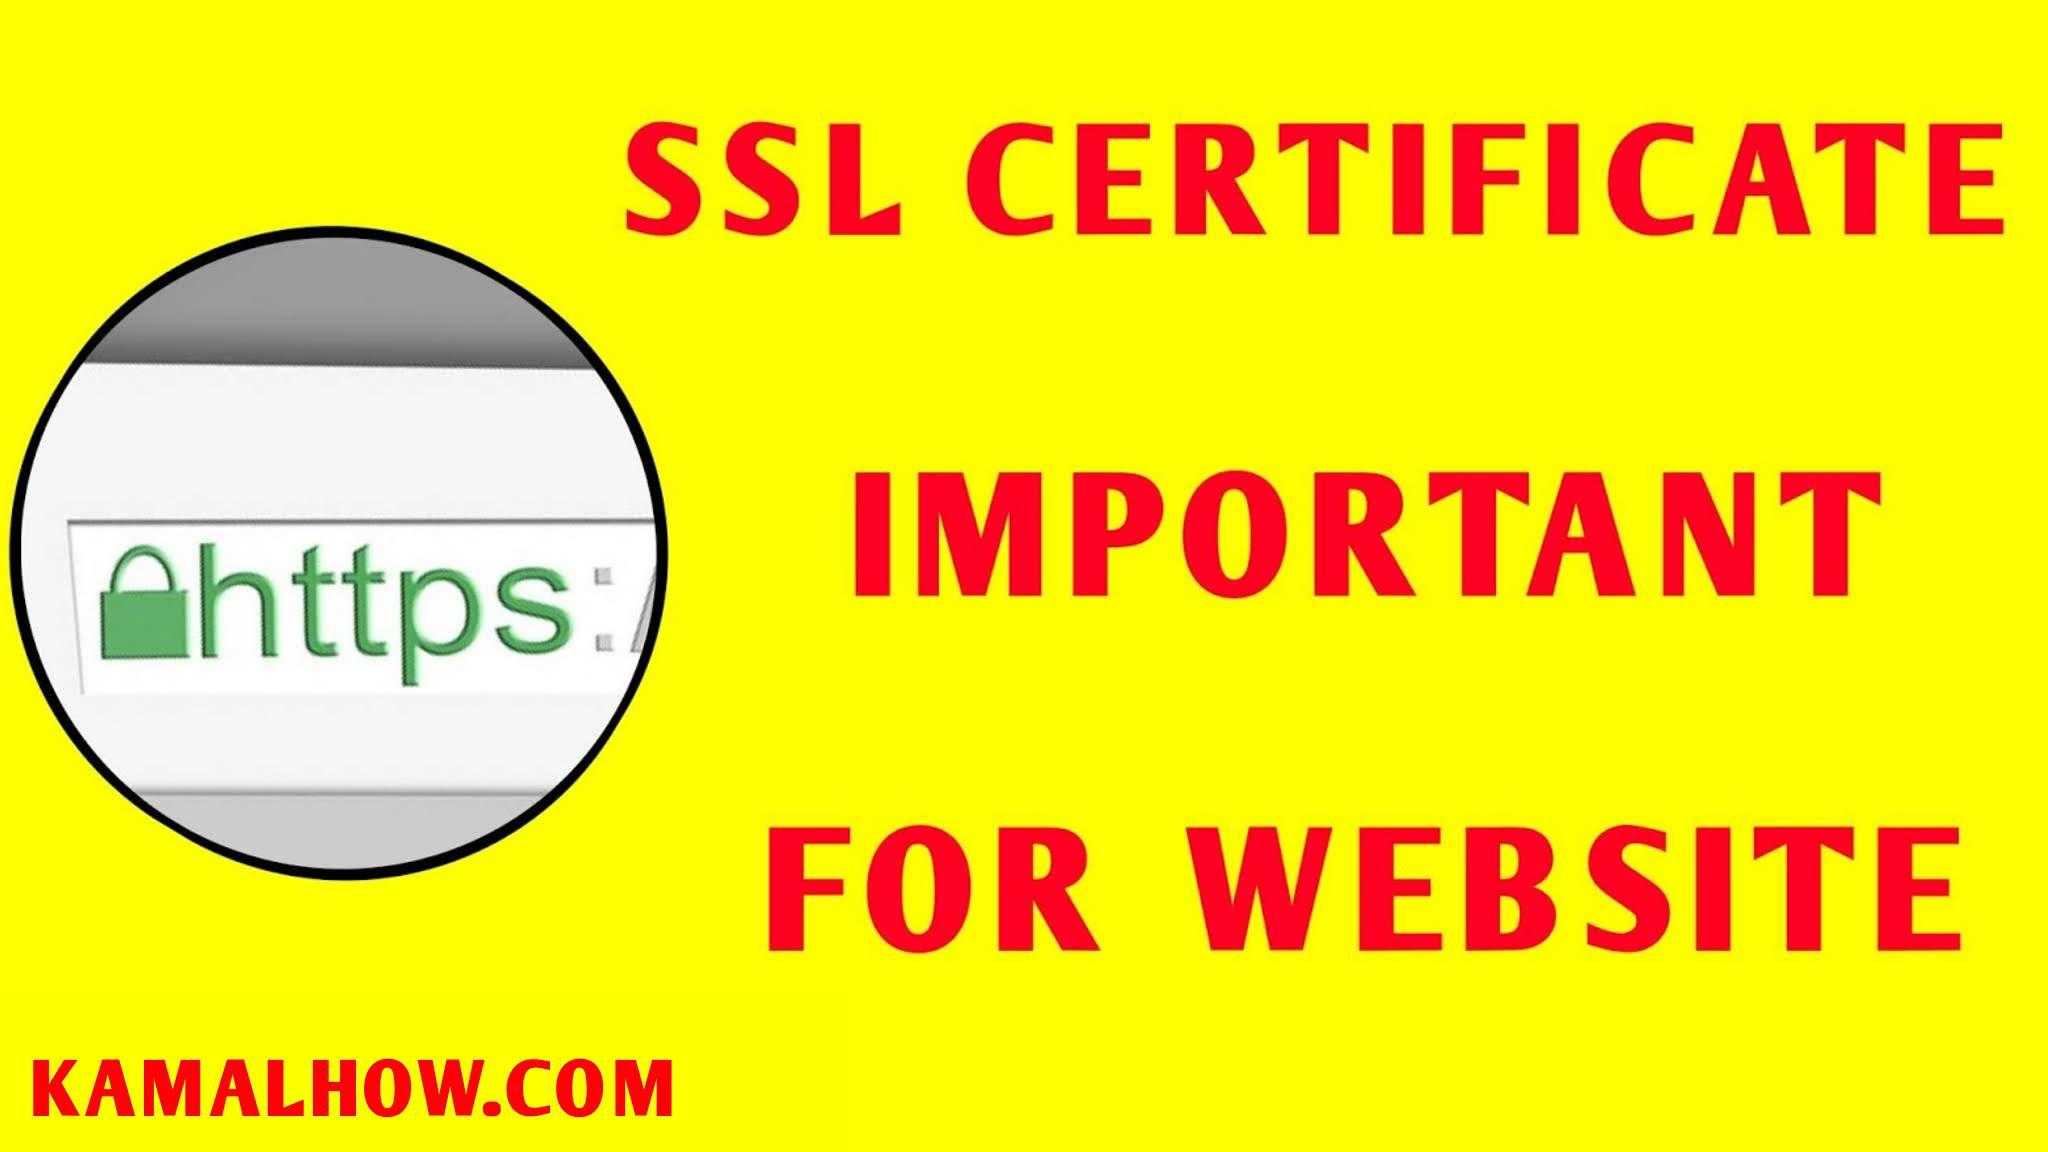 What-is-ssl-certificate-https-security-full-explain-hindi-tutorial-kamal-how-kamalhow-ssl-security-kya-hai-blogger-worpress-hindi-blogging-tips